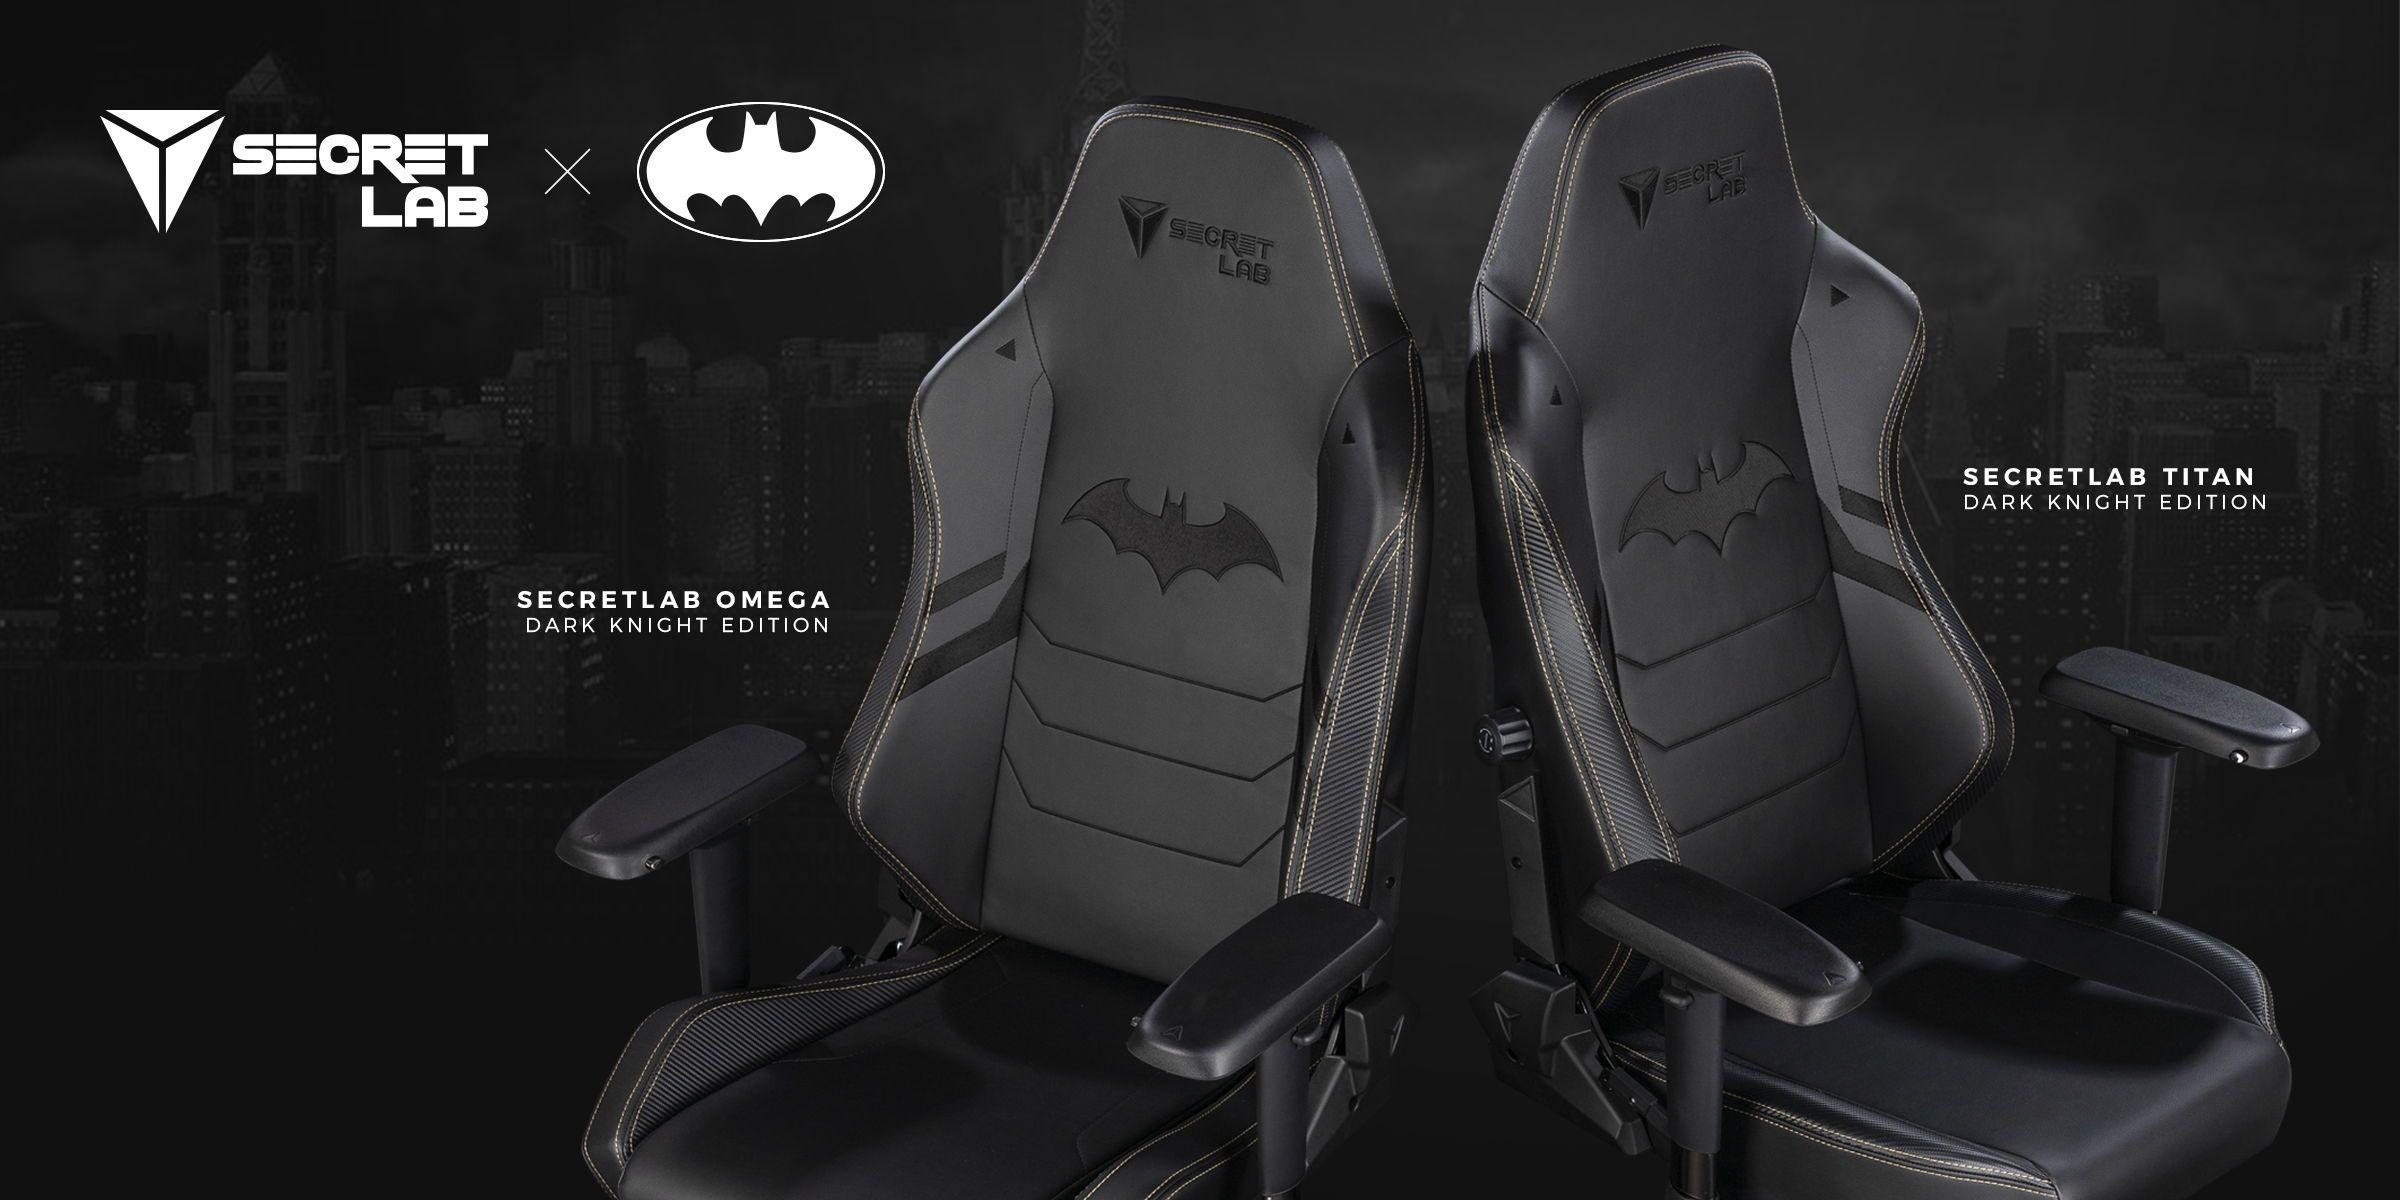 Secretlab Dark Knight Edition Check It Out On Secretlab Co Gaming Chair Geek Culture Anniversary Games